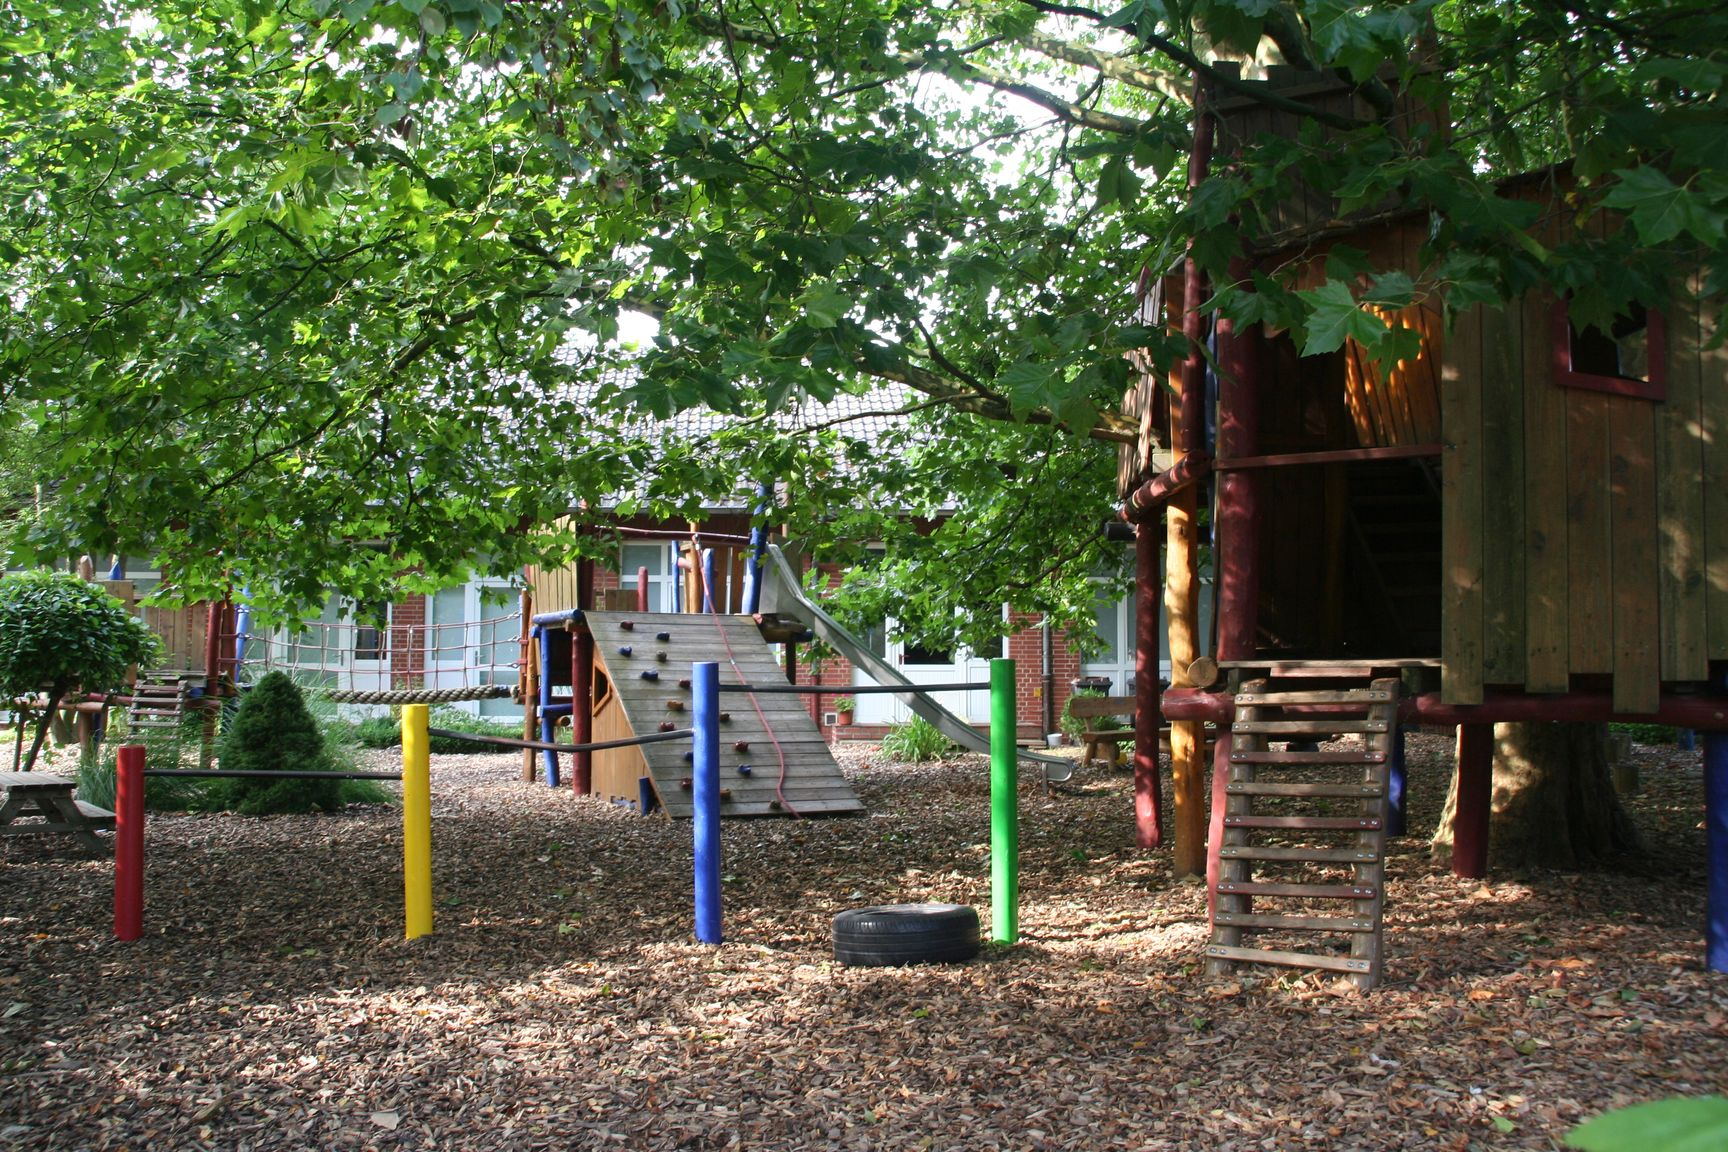 02_Kindergarten_IMG_7434